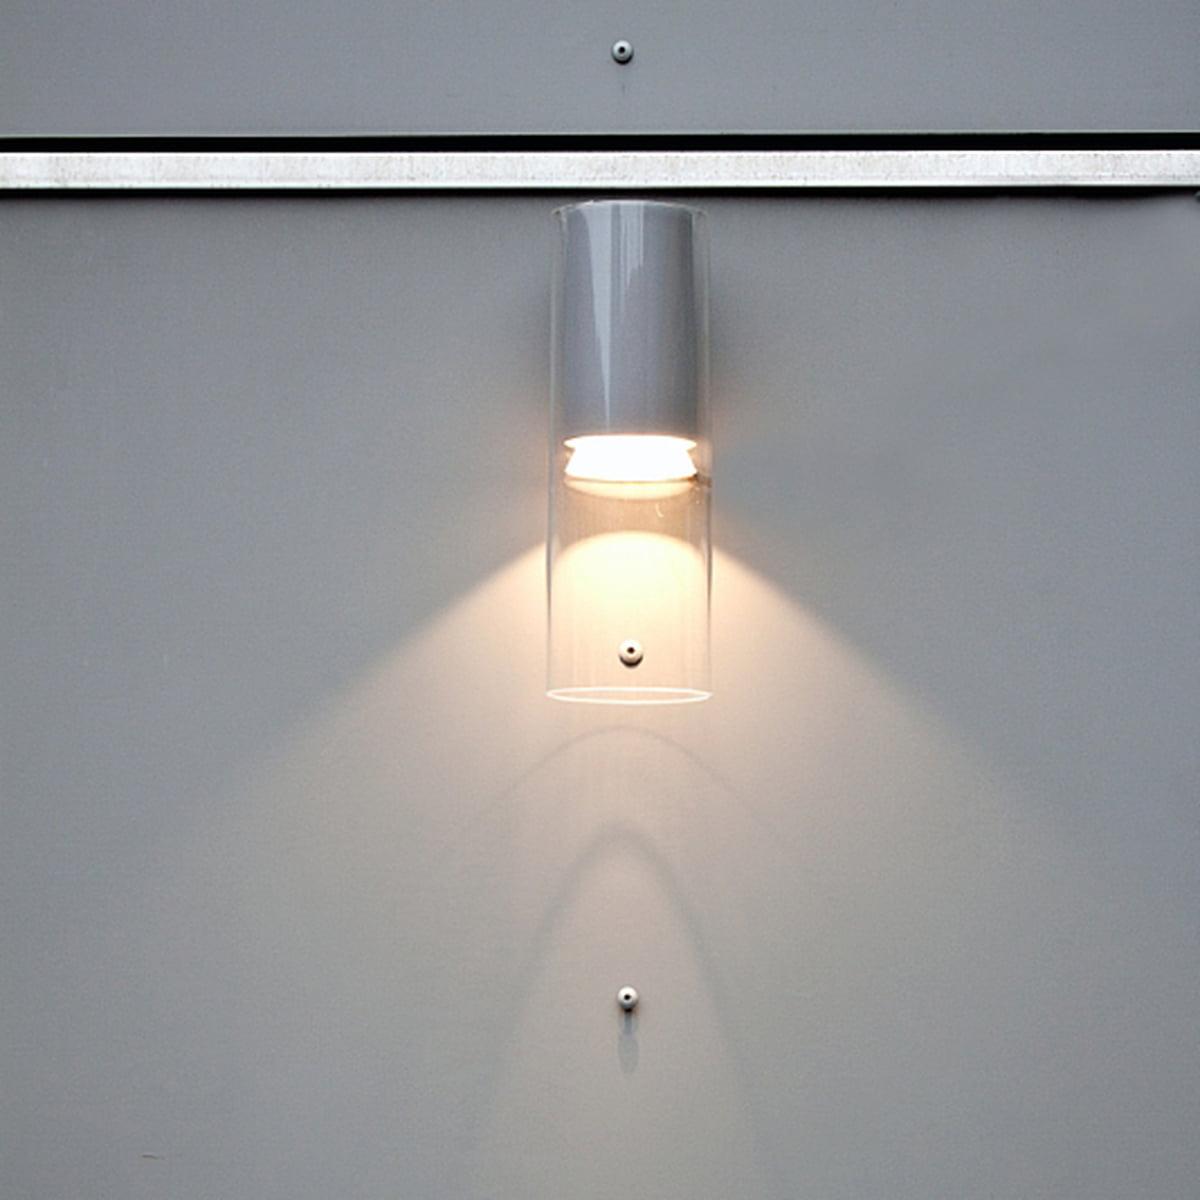 Fp wall lamp led louis poulsen shop louis poulsen f p led wall aloadofball Images